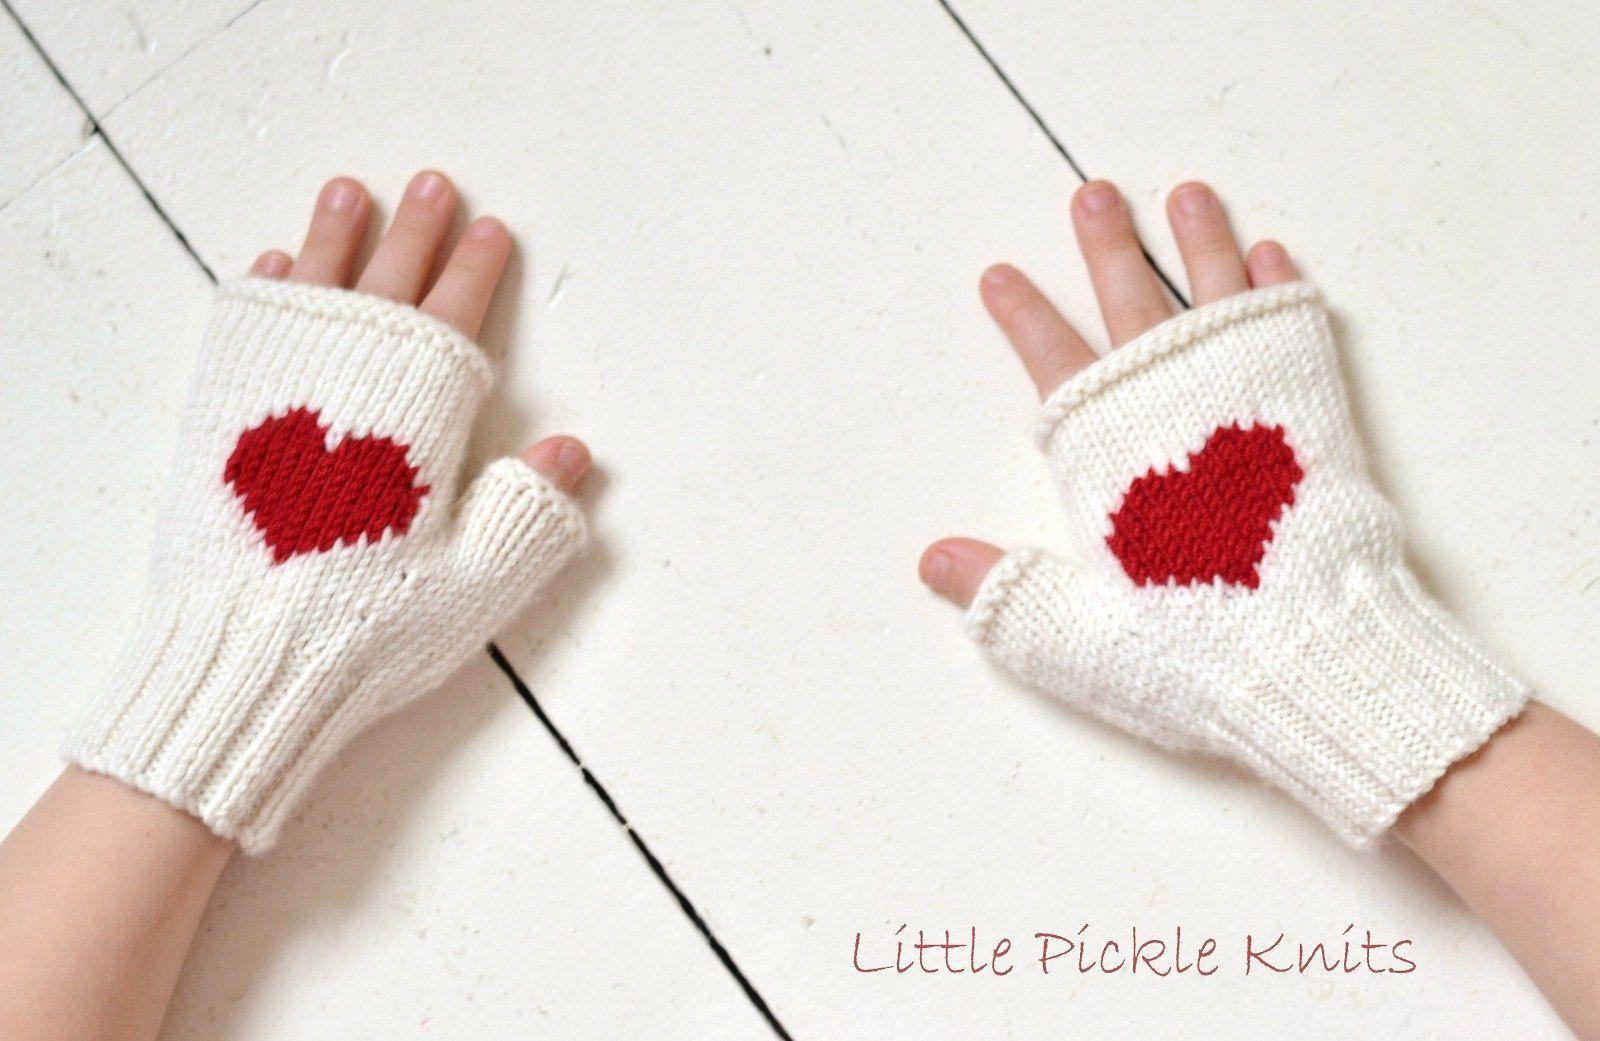 Heart Fingerless Mittens pattern by Linda Whaley